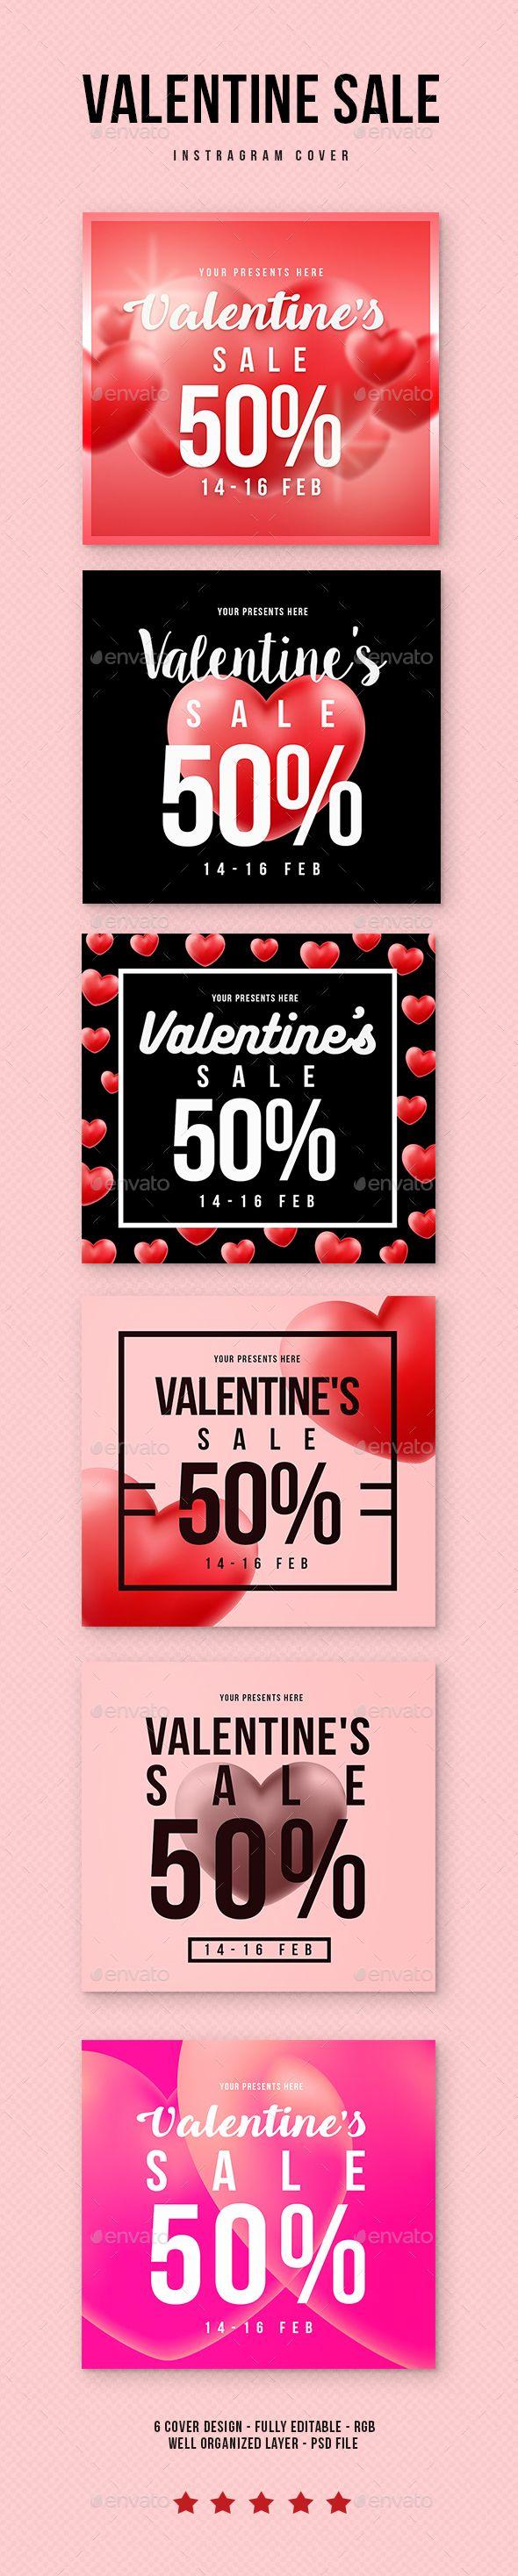 Valentine Sale Instragram Banners Template PSD